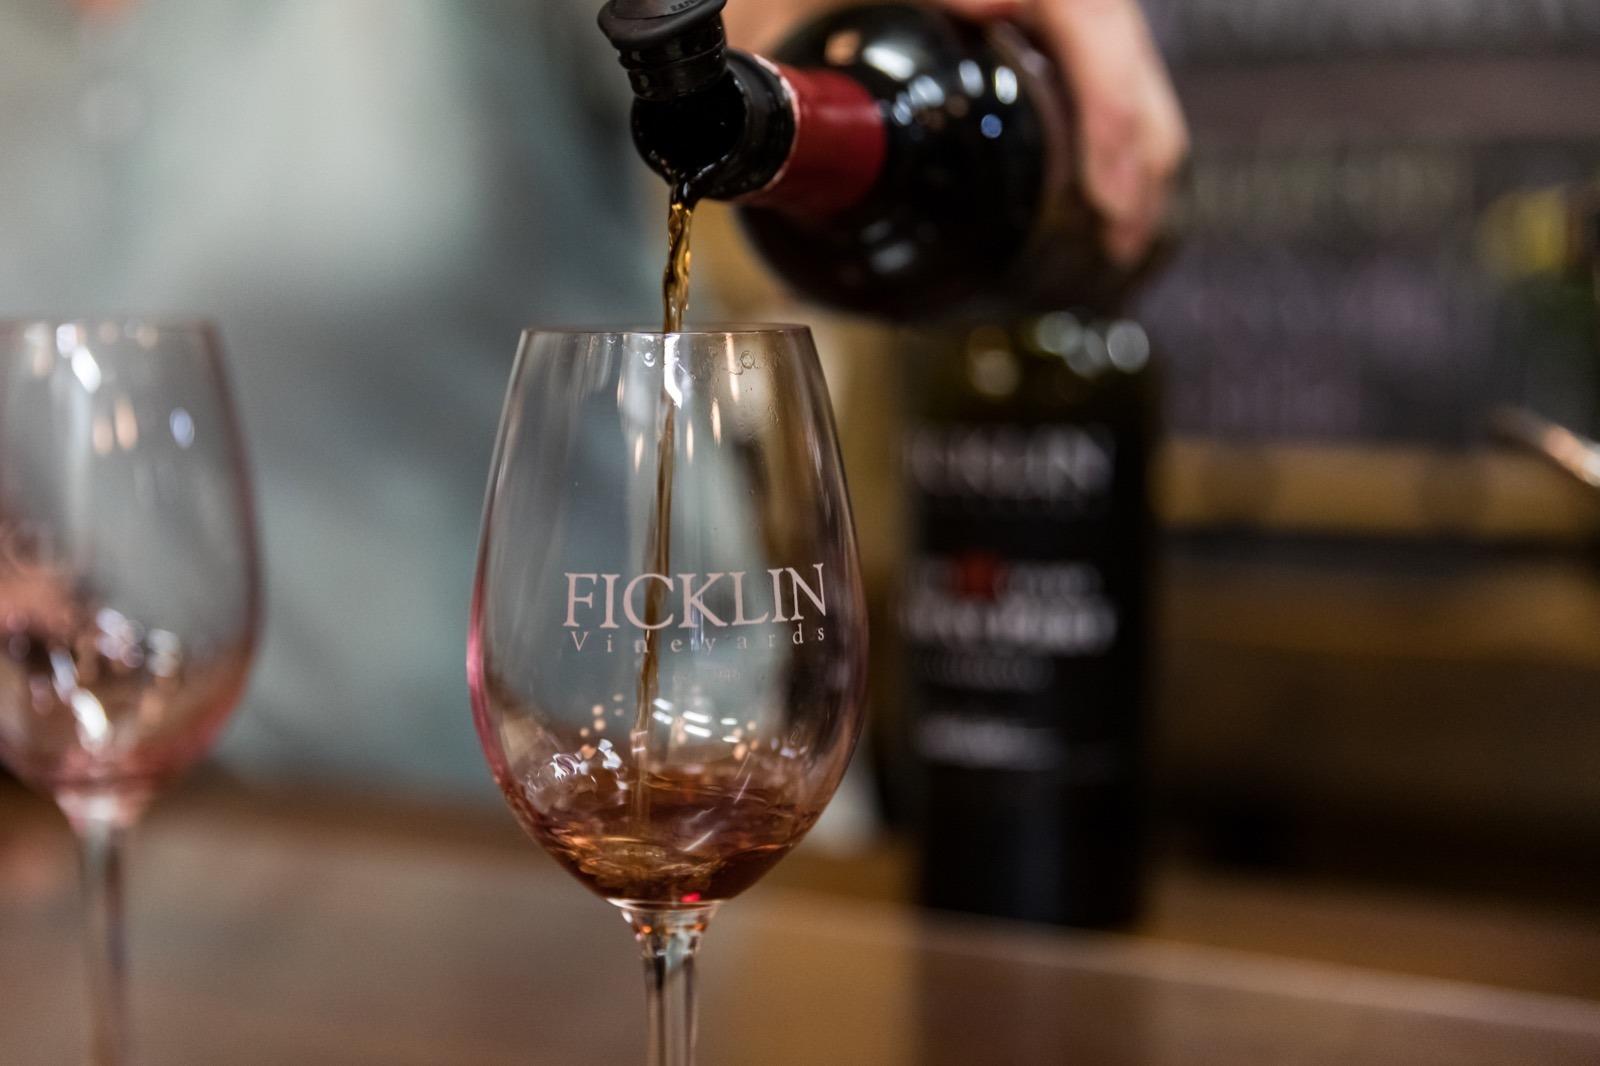 california-high-sierra-madera-ficklin-vineyard-2